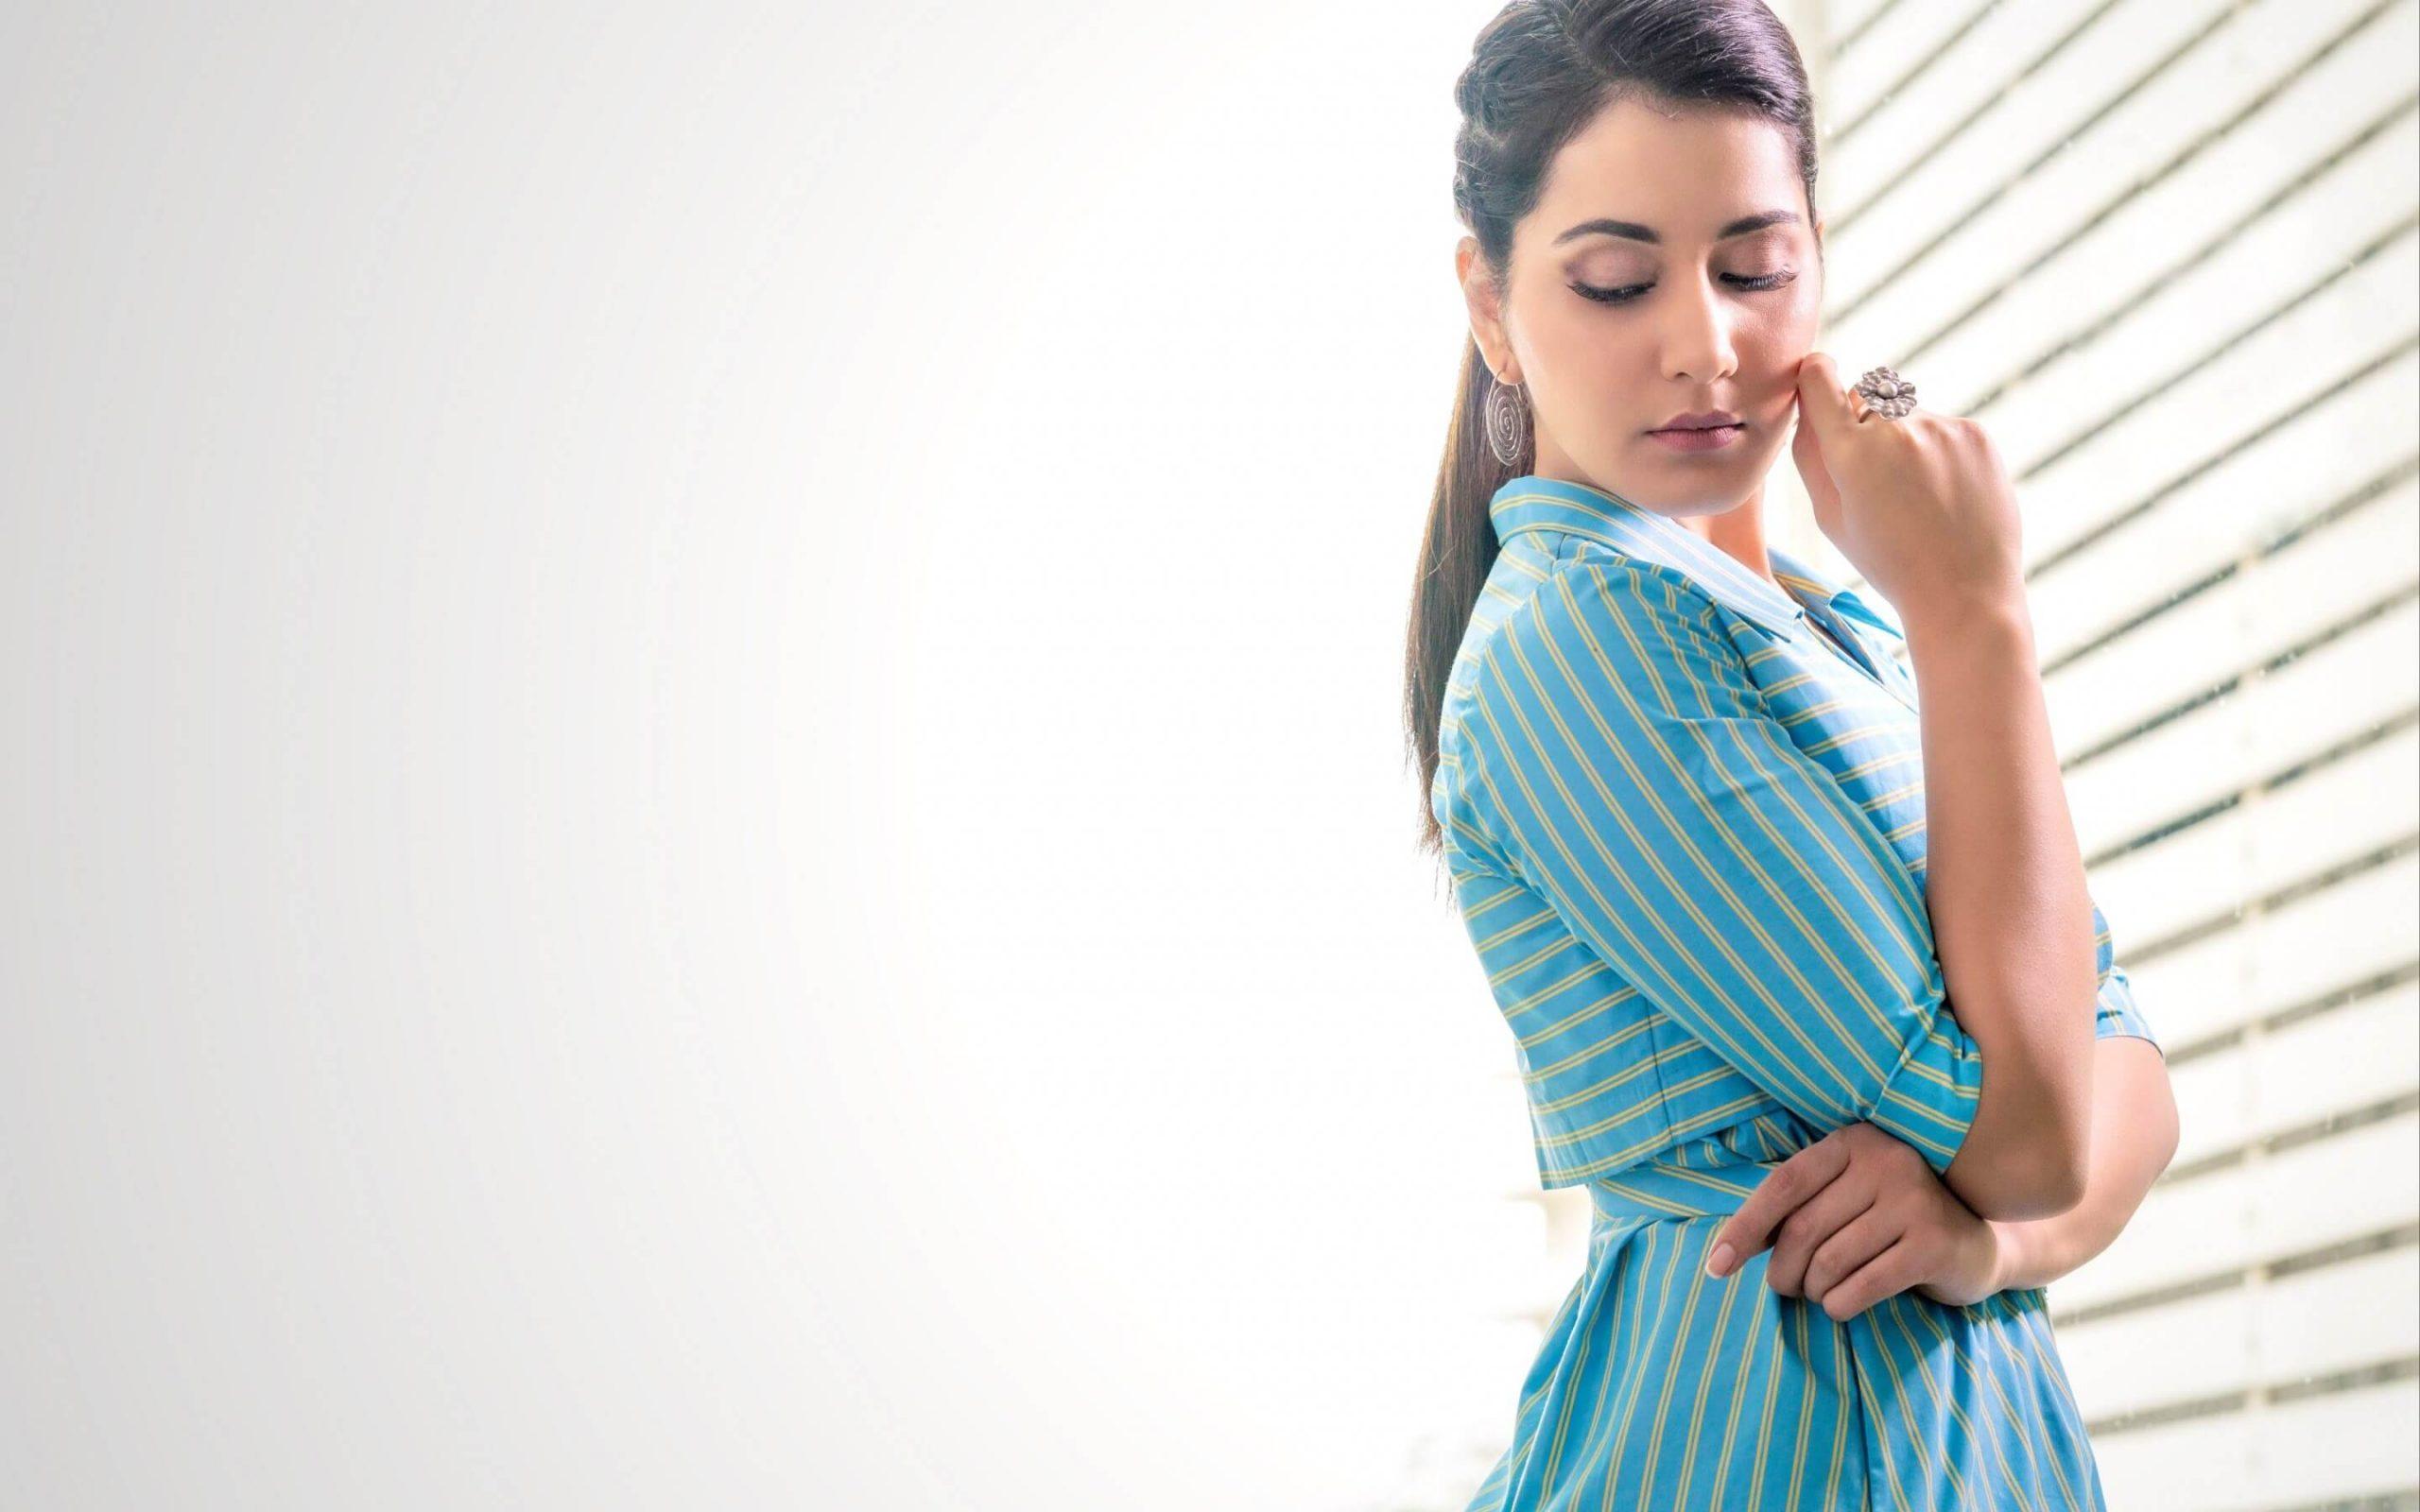 Rashi Khanna Photos(images), Age, Height, Biography, Date Of Birth, Marriage, Details, Family, Net Worth, Boyfriend, Education, Insta, Wiki, Twitter, Imdb, Youtube, Facebook (43)